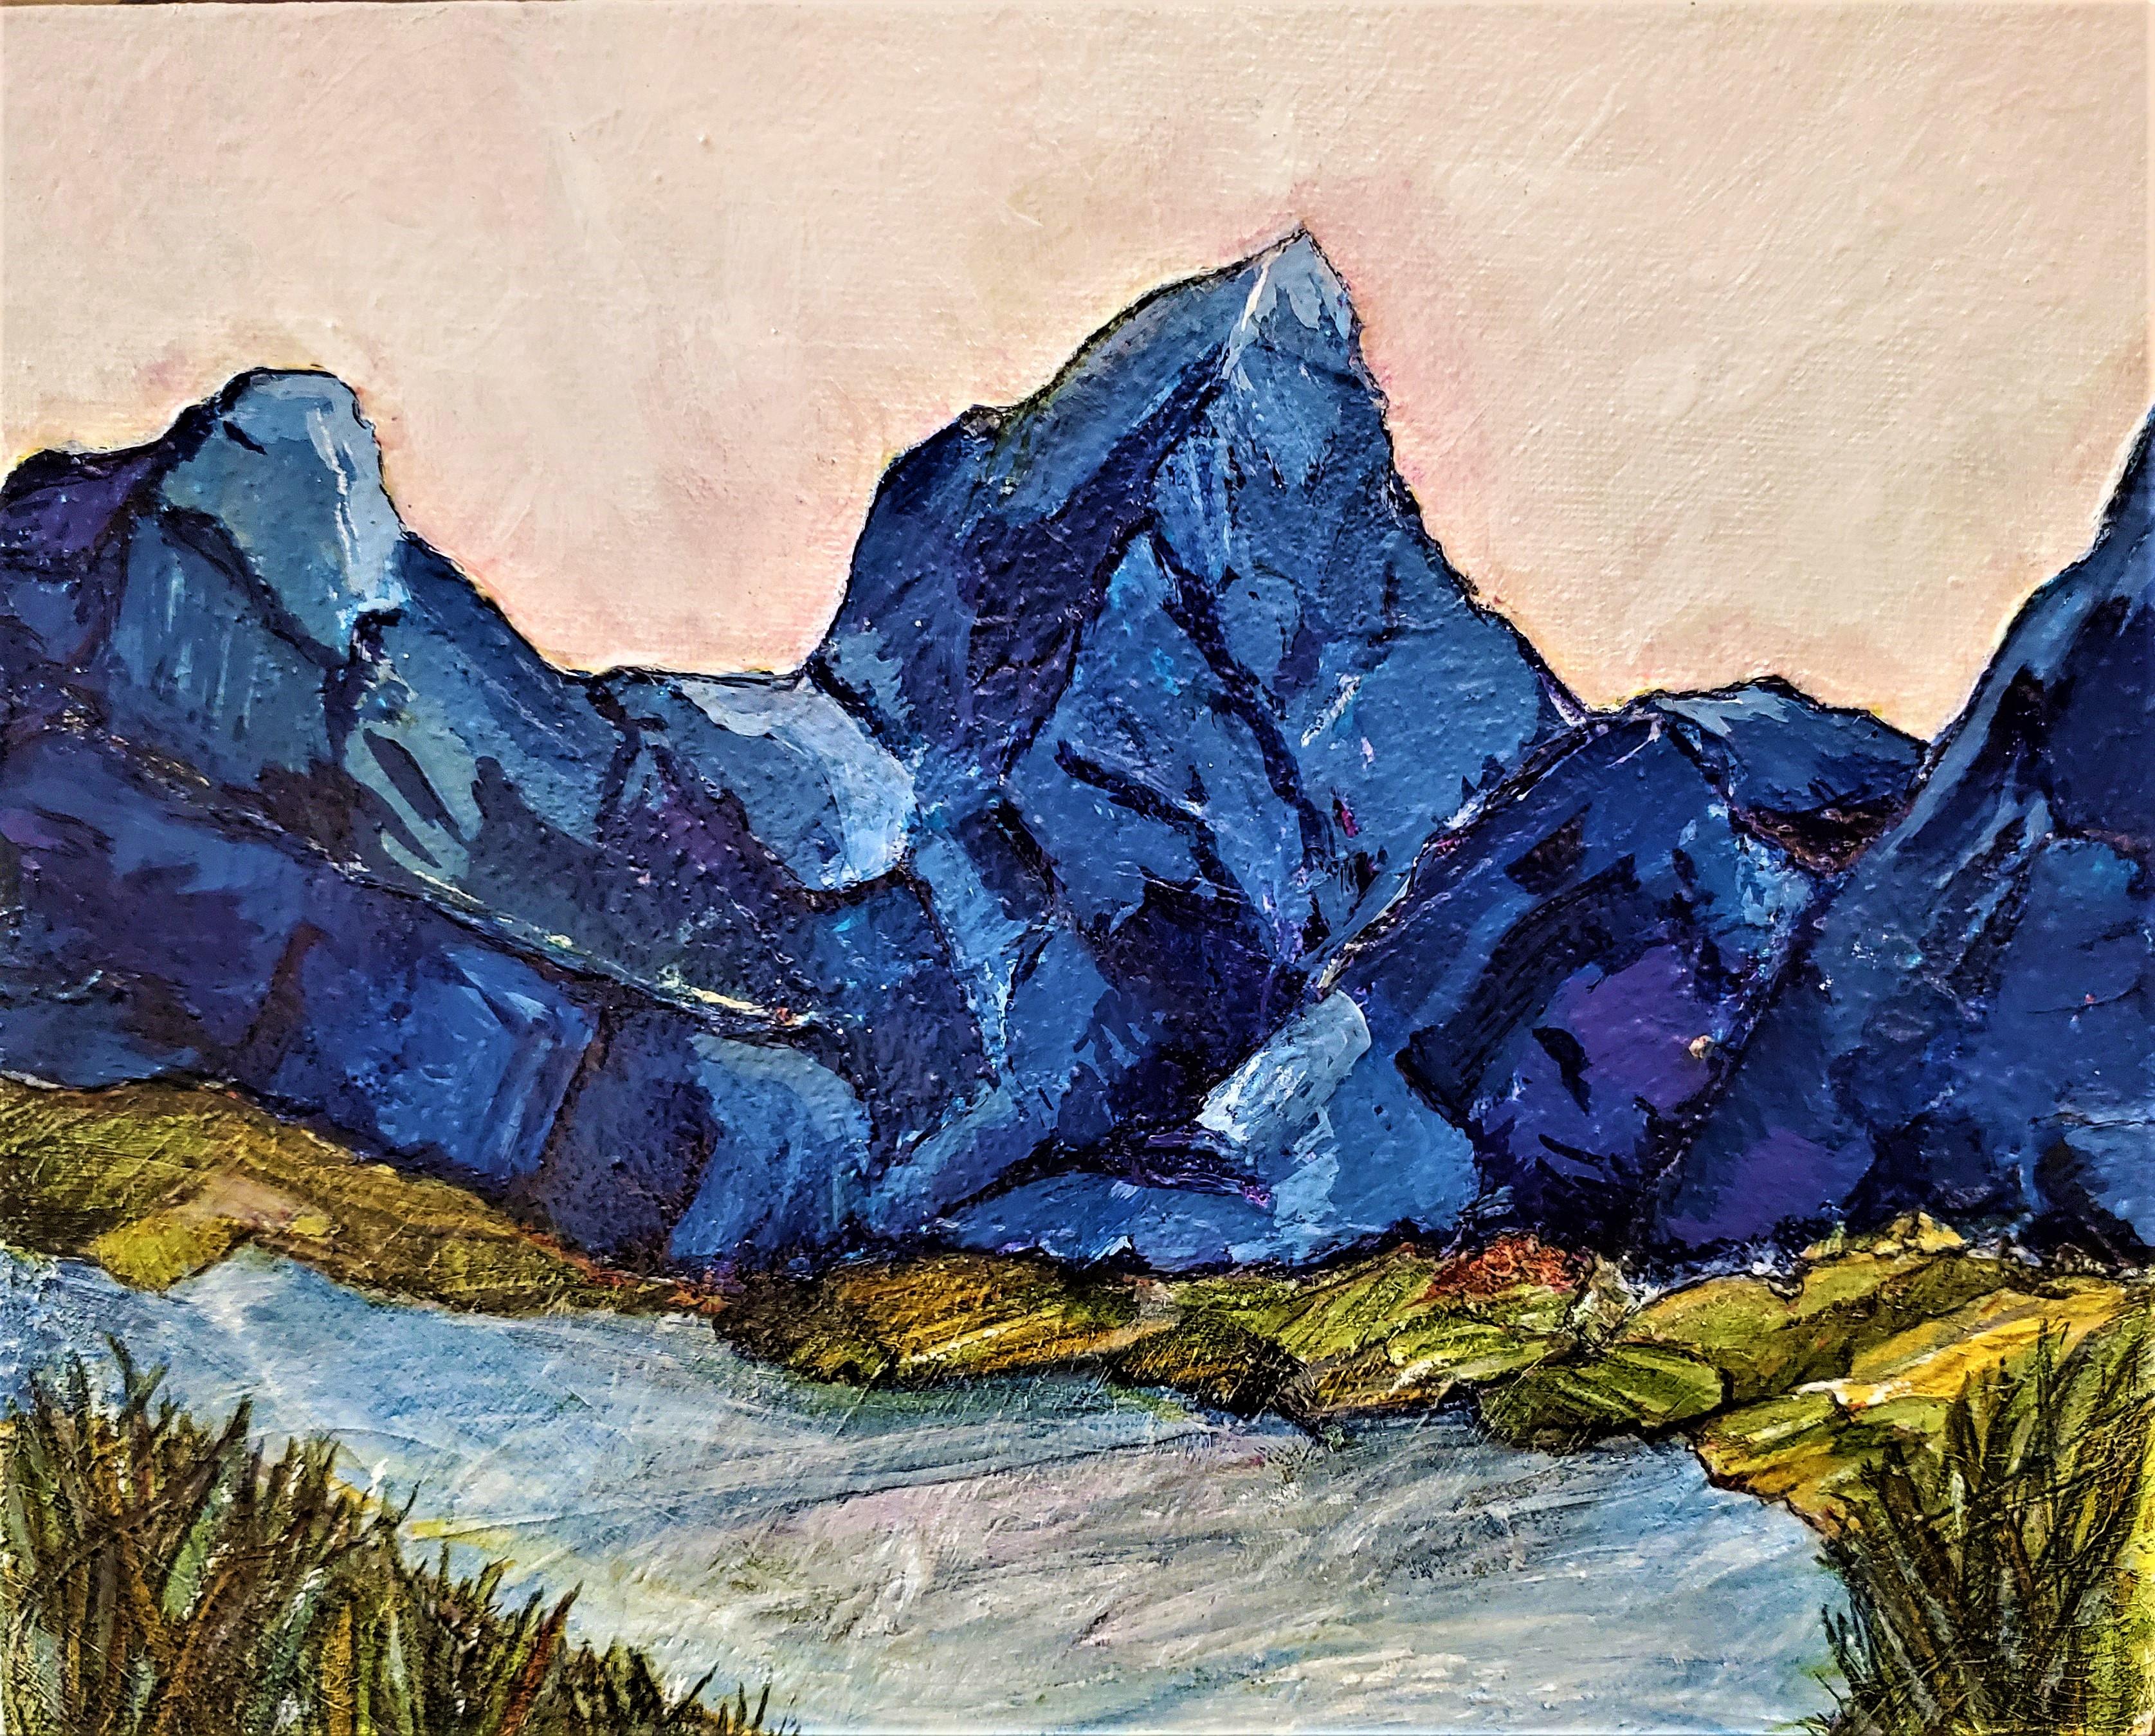 Blue mountain scene